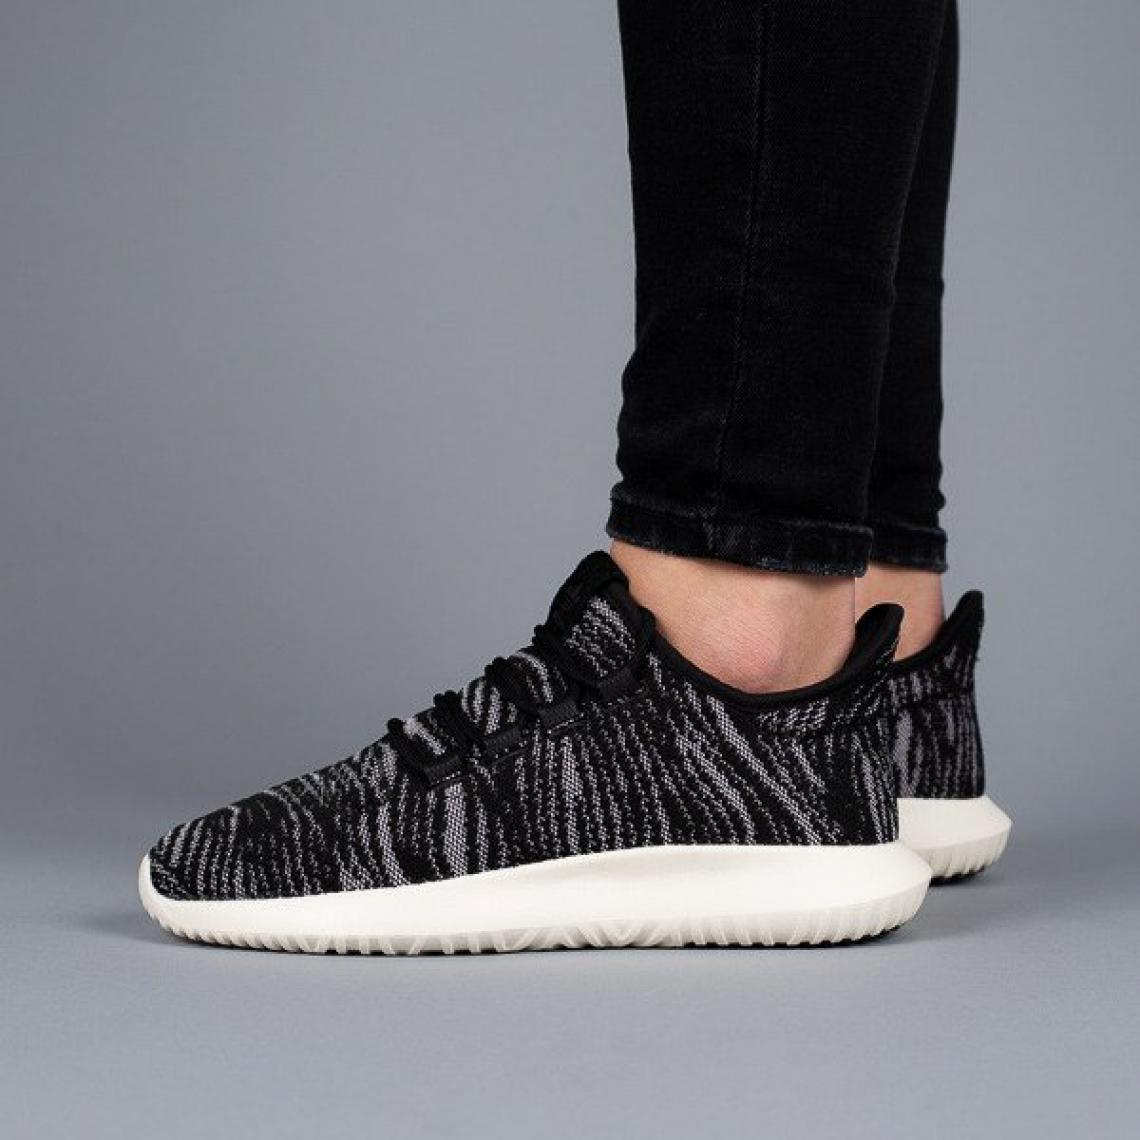 sneakers sneakers later TUBULAR SHADOW W adidas Originals | 3 SUISSES